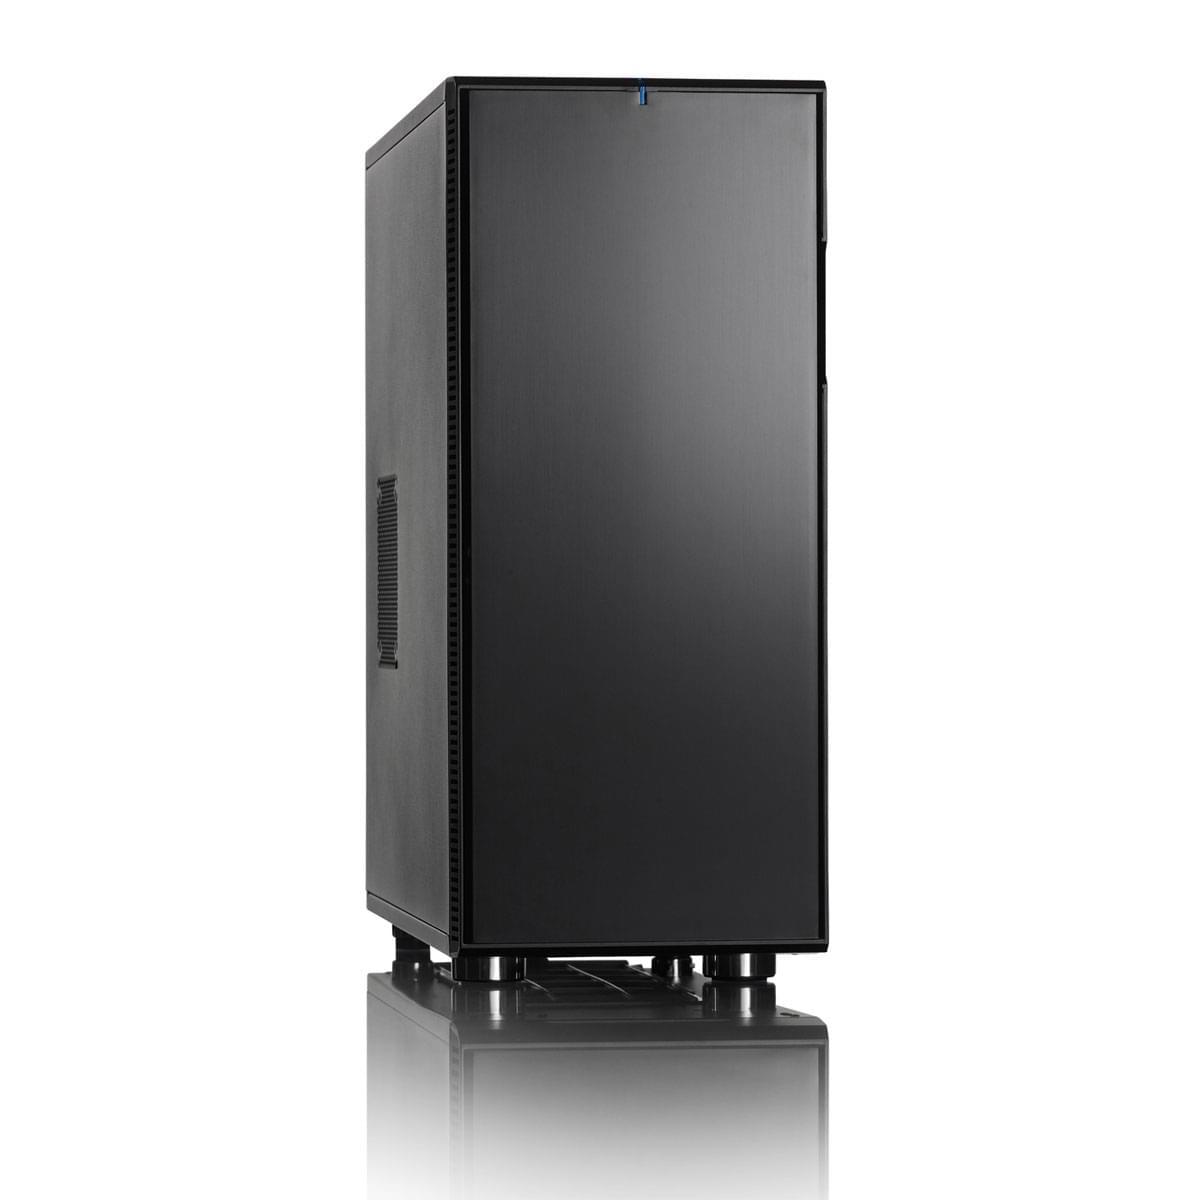 Fractal Design Define XL R2 Black Pearl (FD-CA-DEF-XL-R2-BL --) - Achat / Vente Boîtier PC sur Cybertek.fr - 0